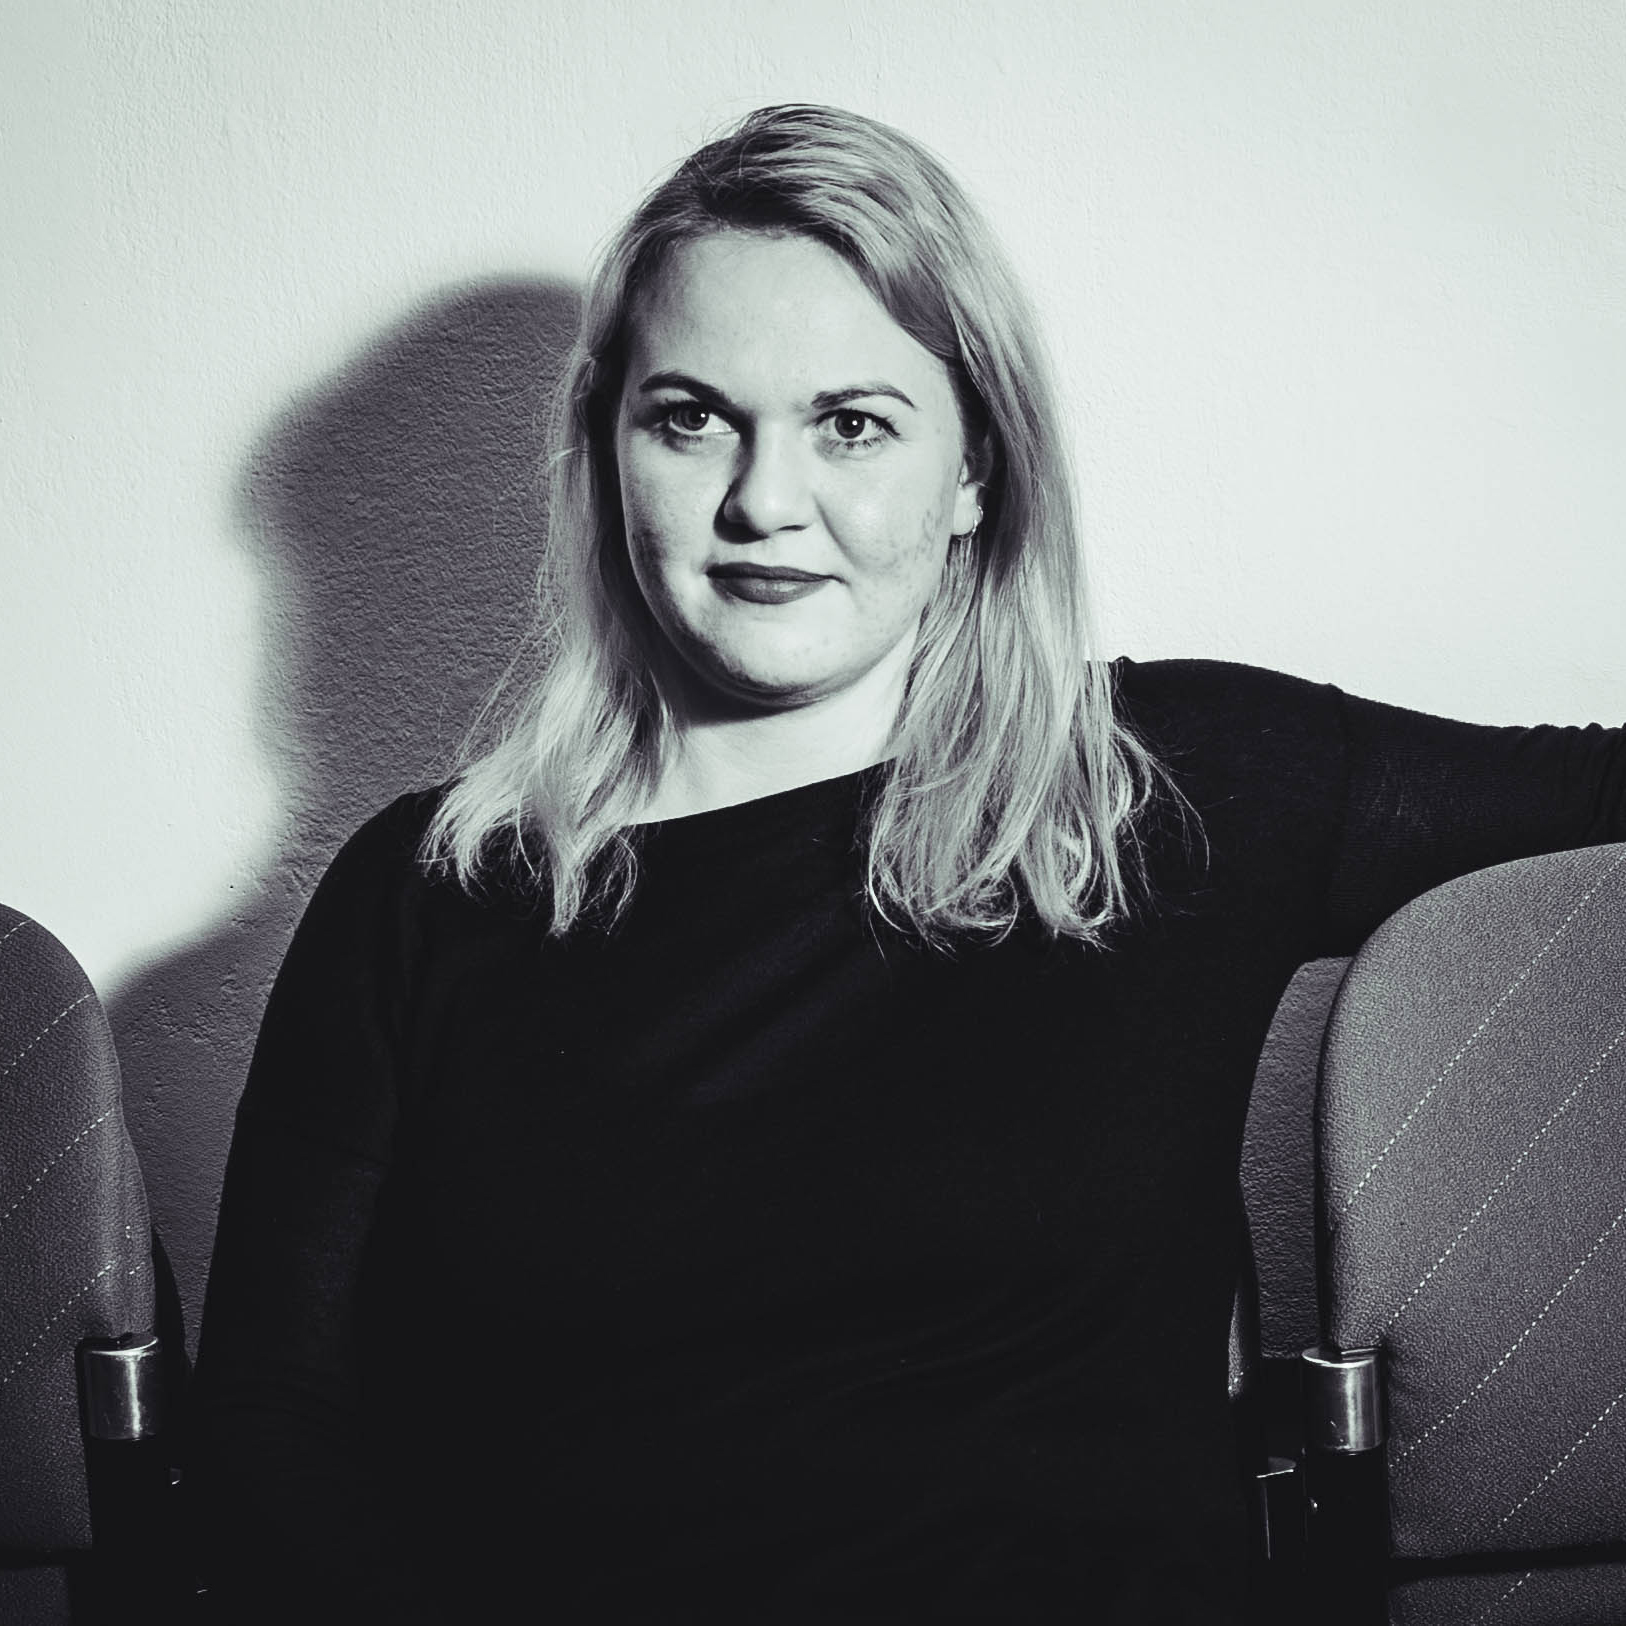 Janea Hansen